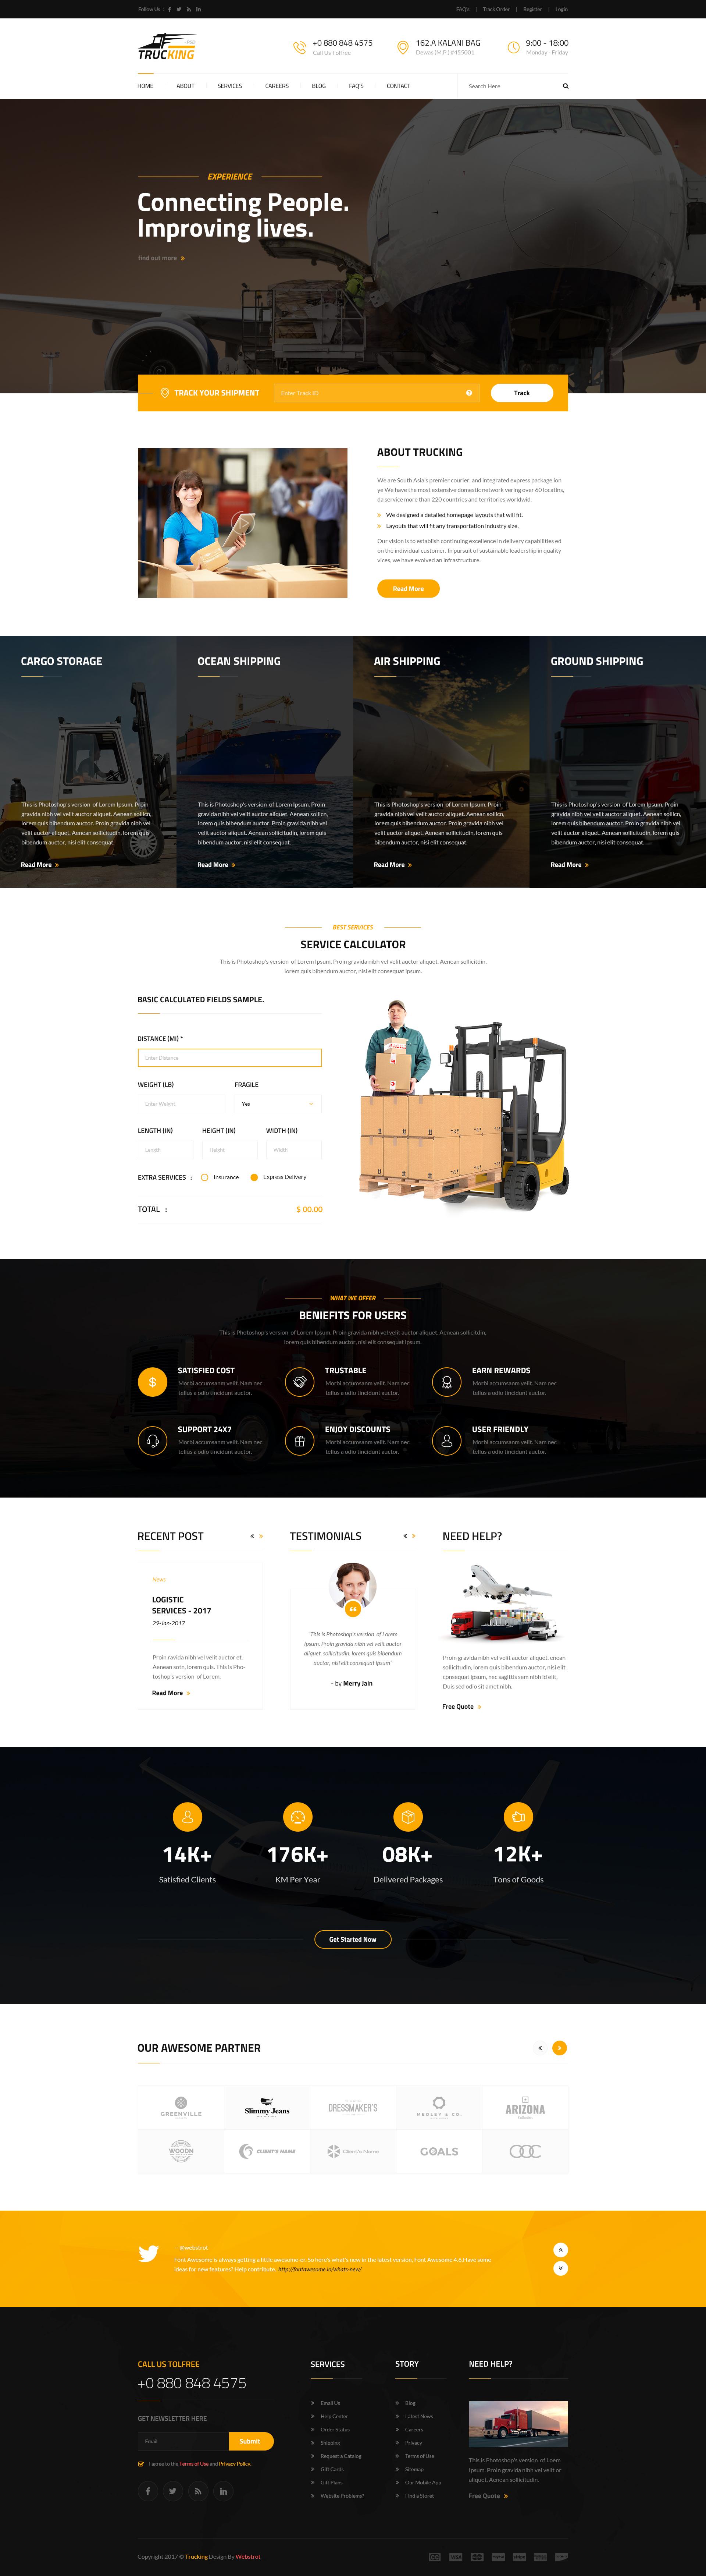 Trucking logistics and transportation psd template